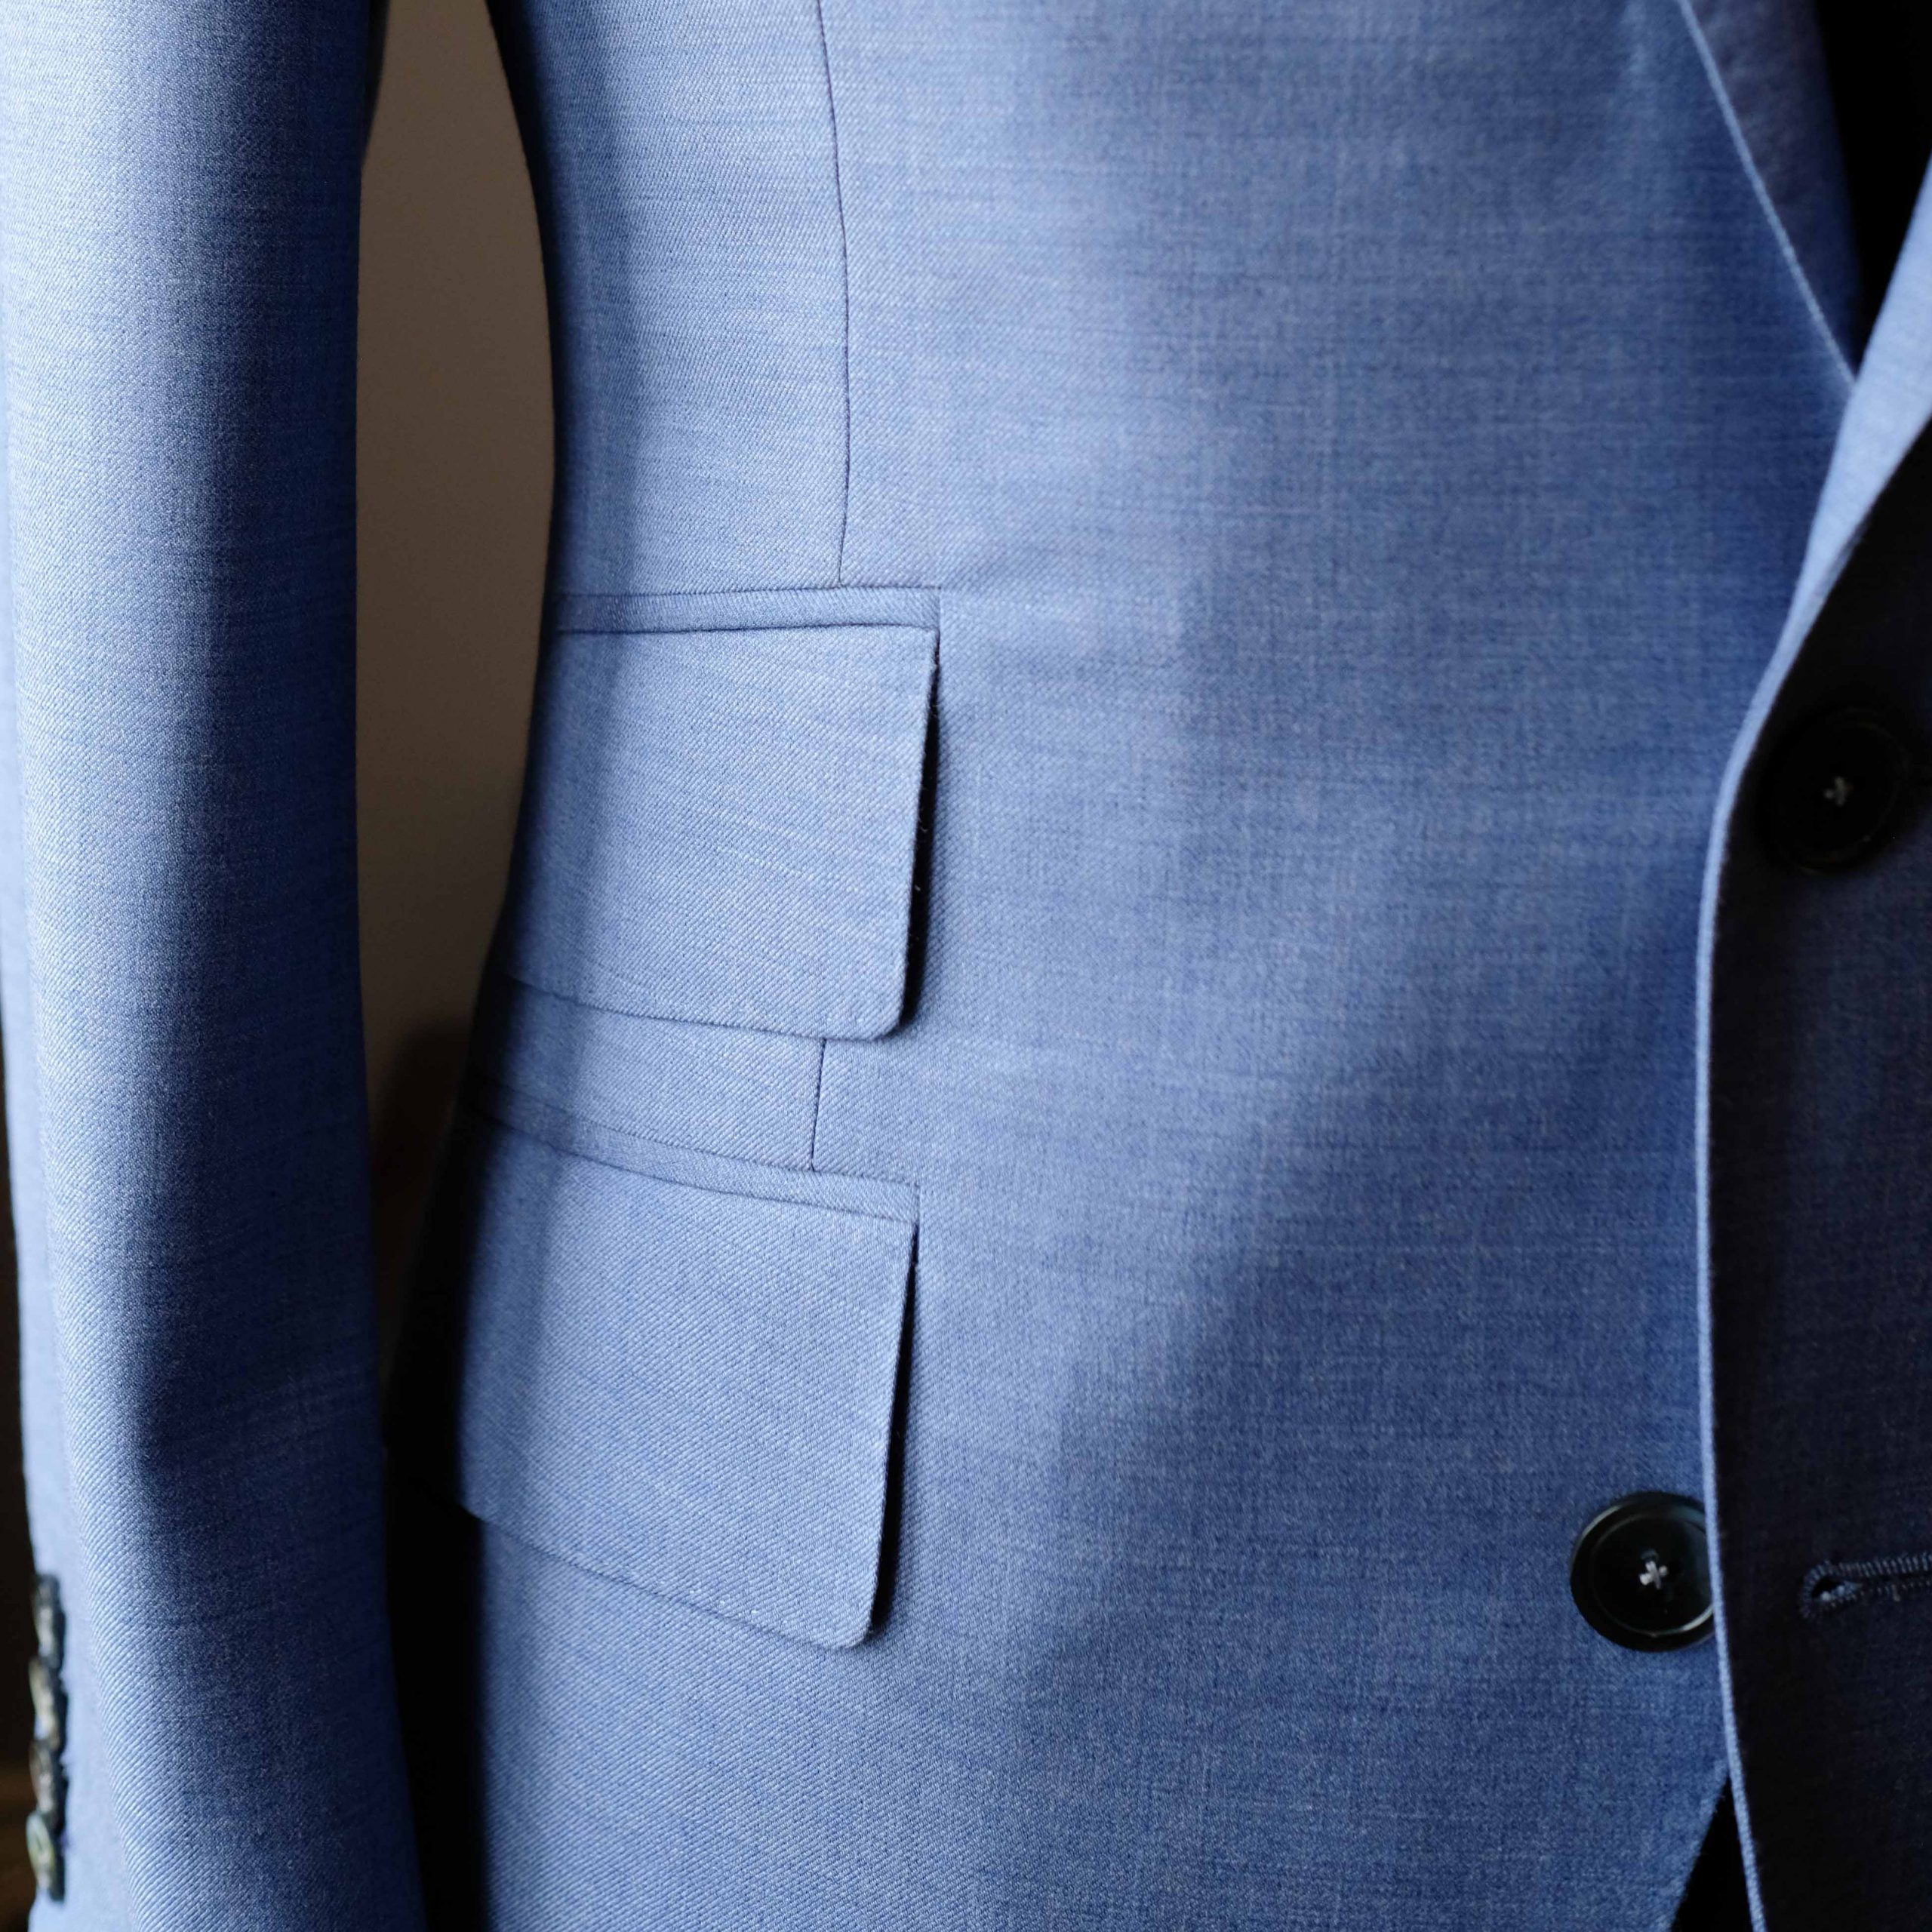 Bespoke Suit Jacket - Ticket Pocket - Toronto